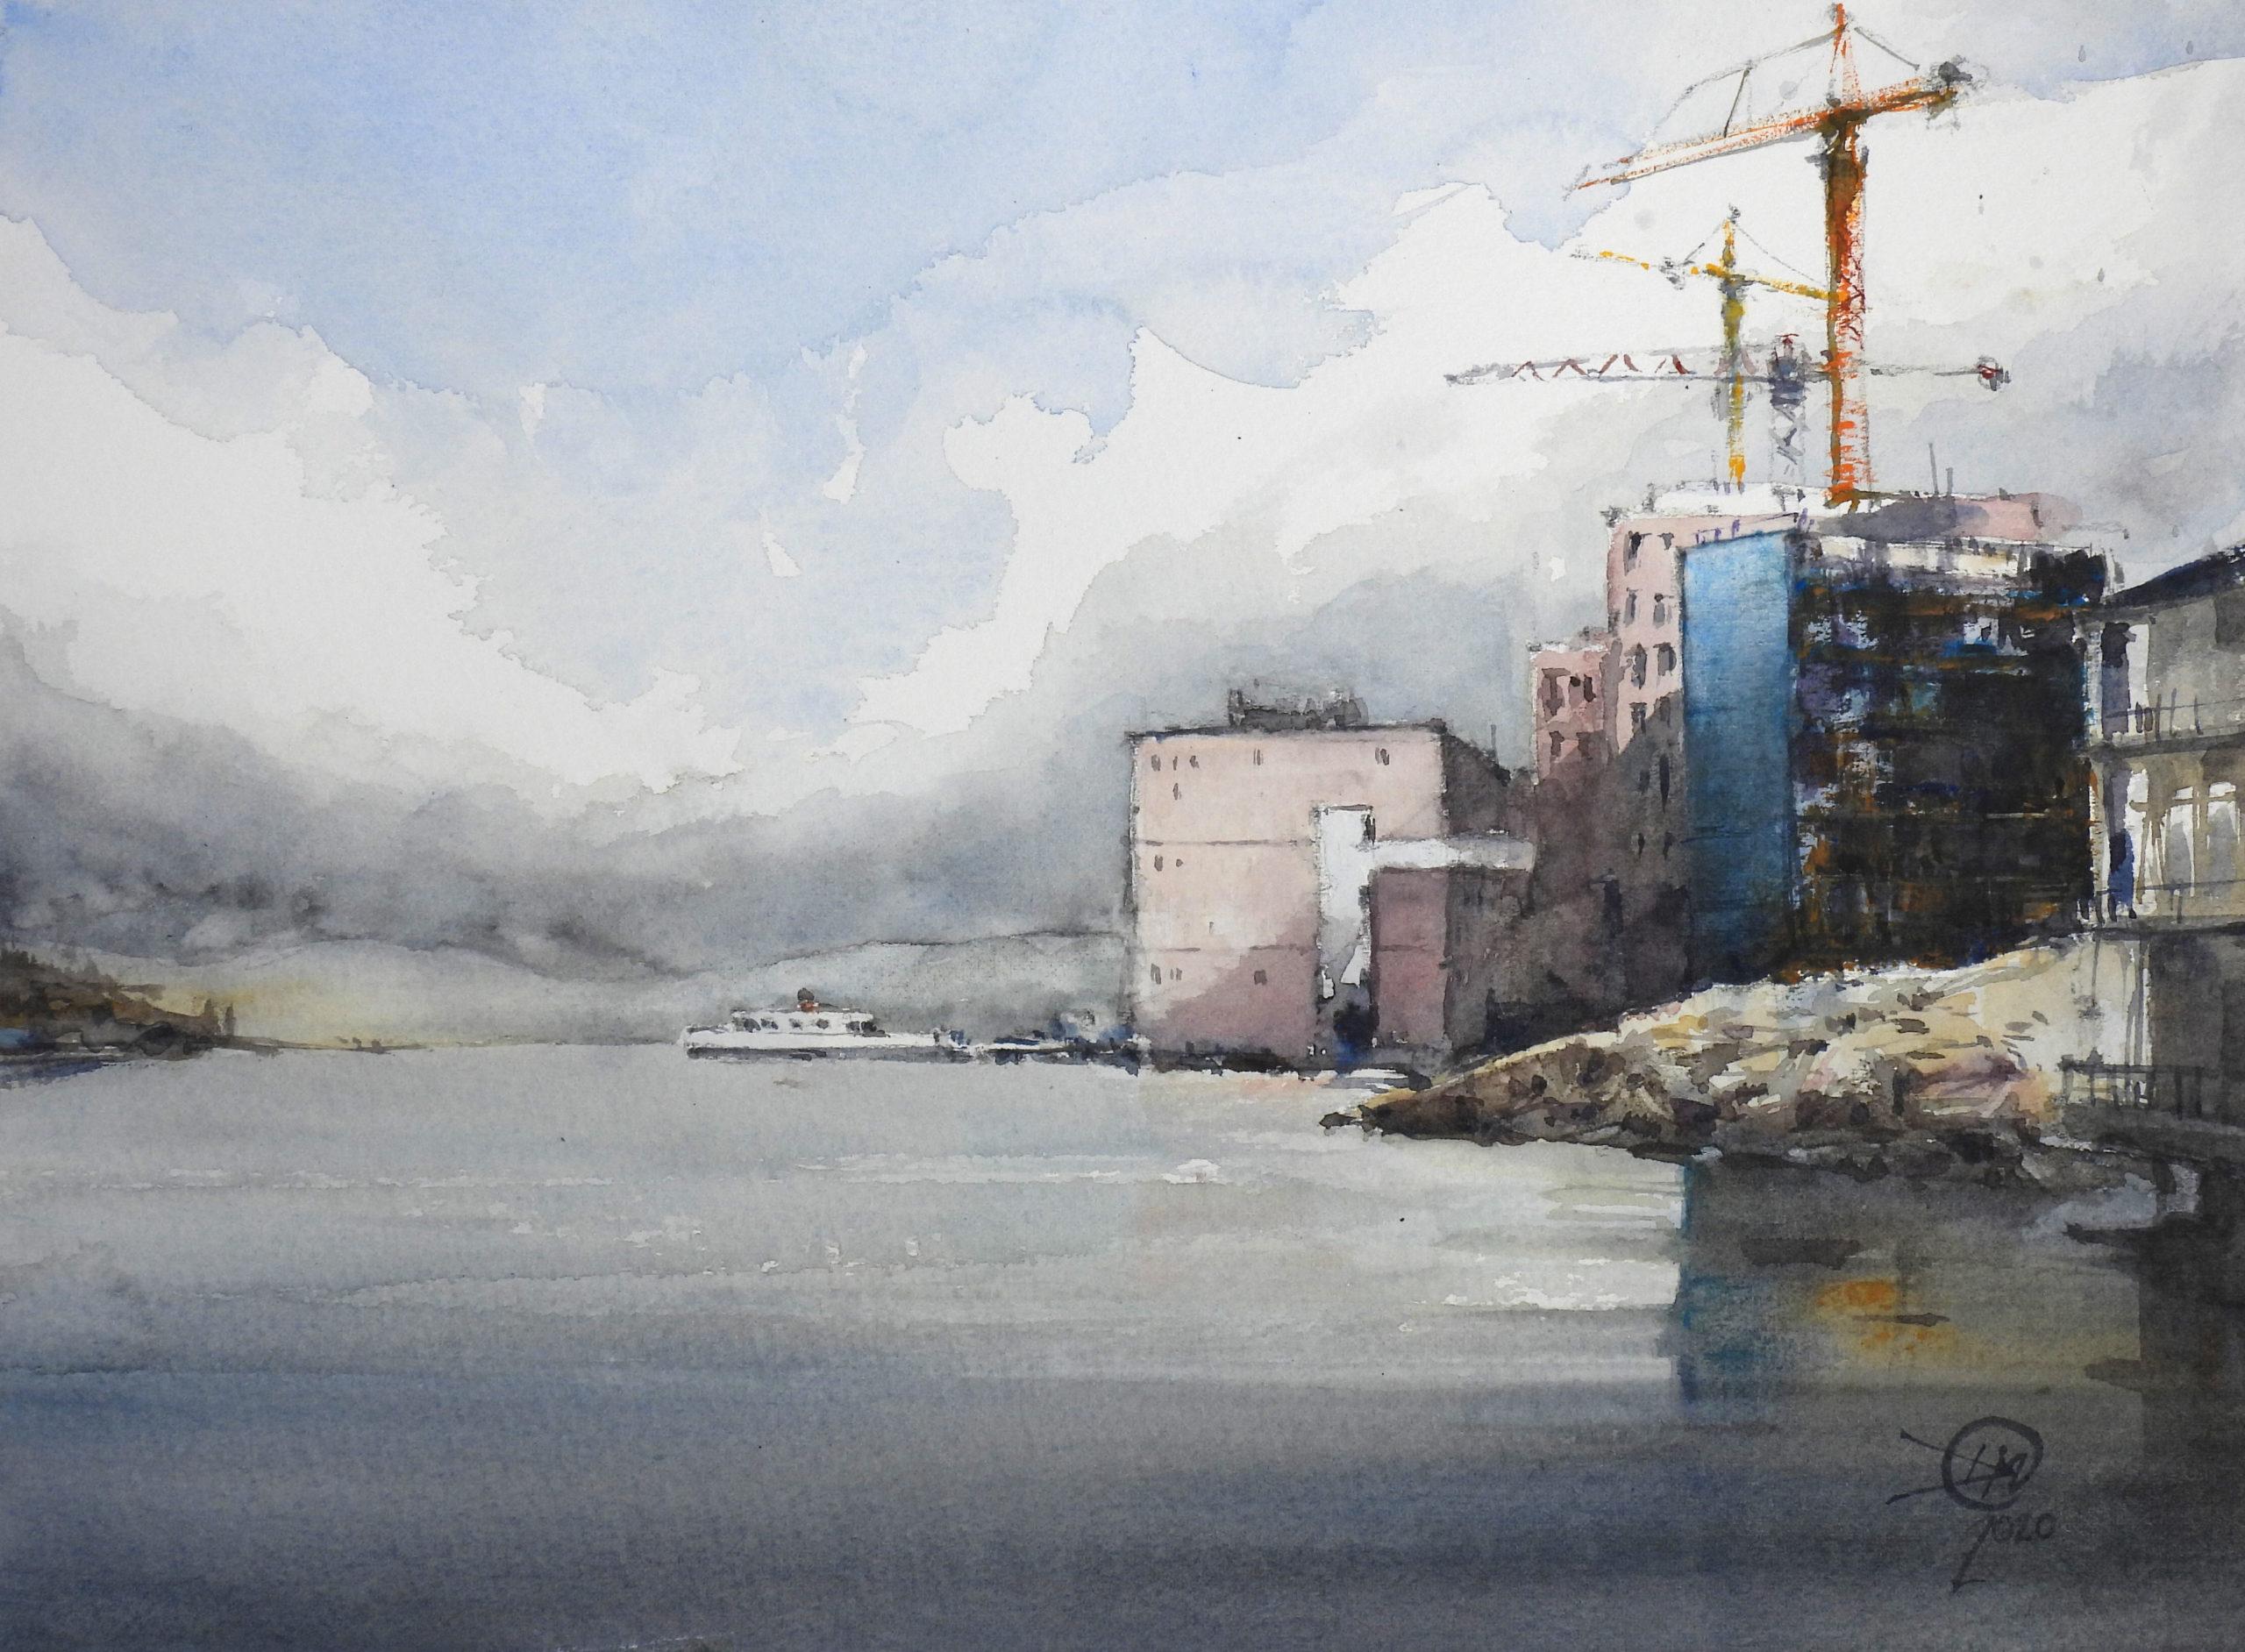 Finnboda hamn